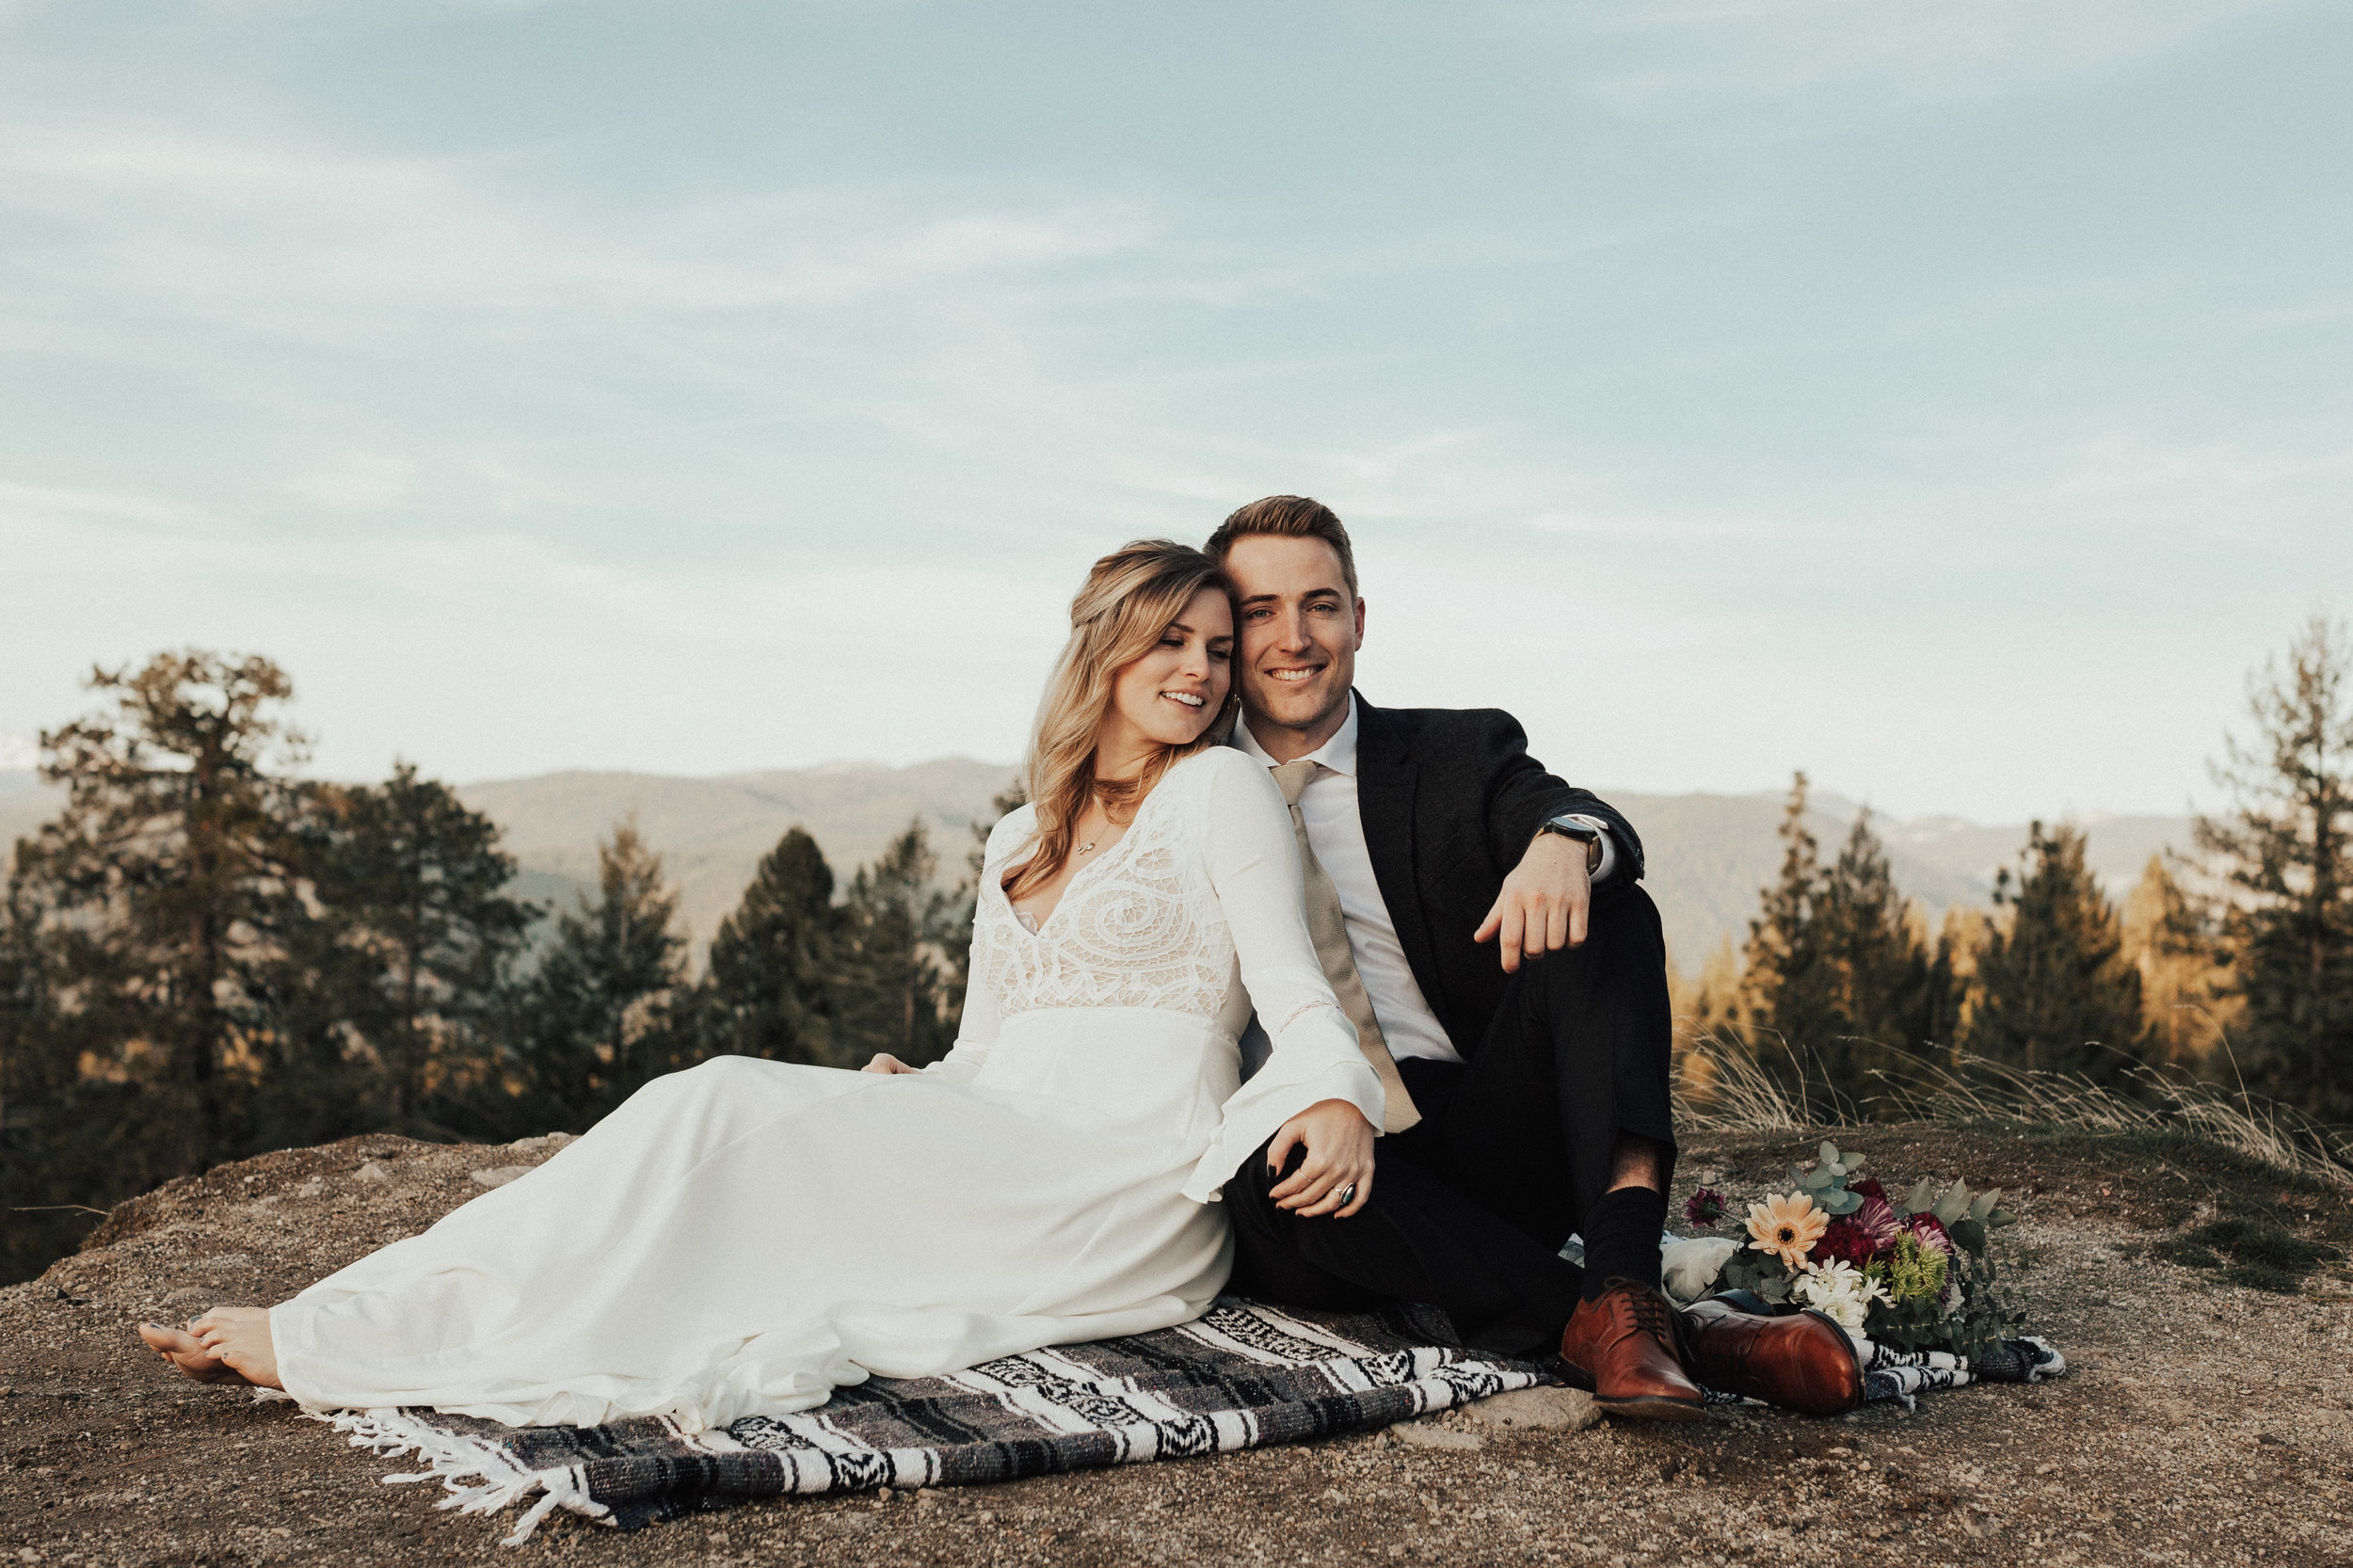 Intimate wedding photographer Sacramento